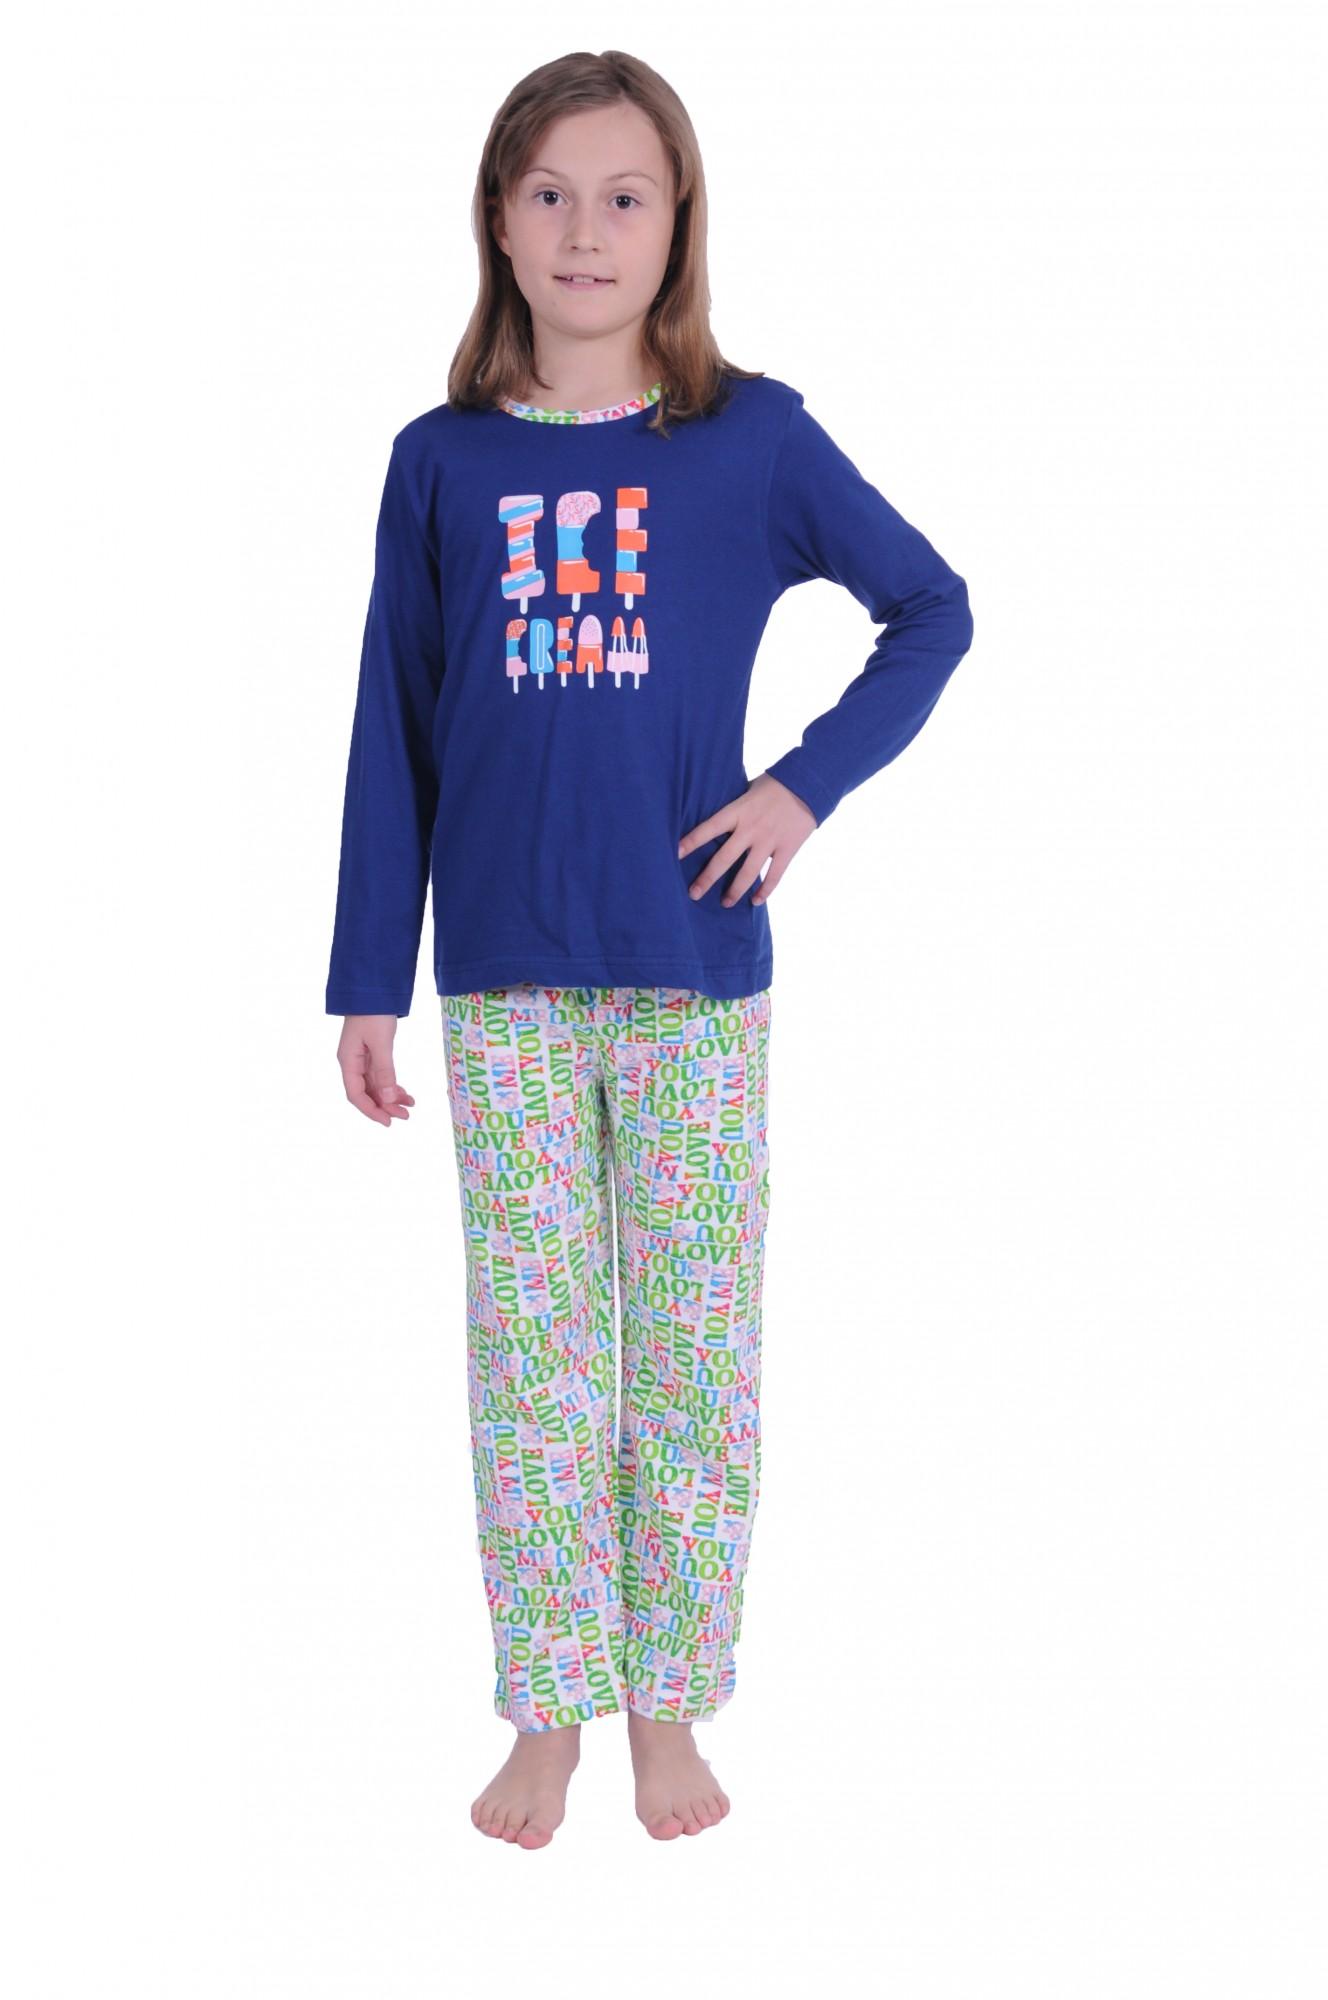 Cooler Mädchen Kinder Pyjama langarm in tollen Farben 171 401 90 842 – Bild 1